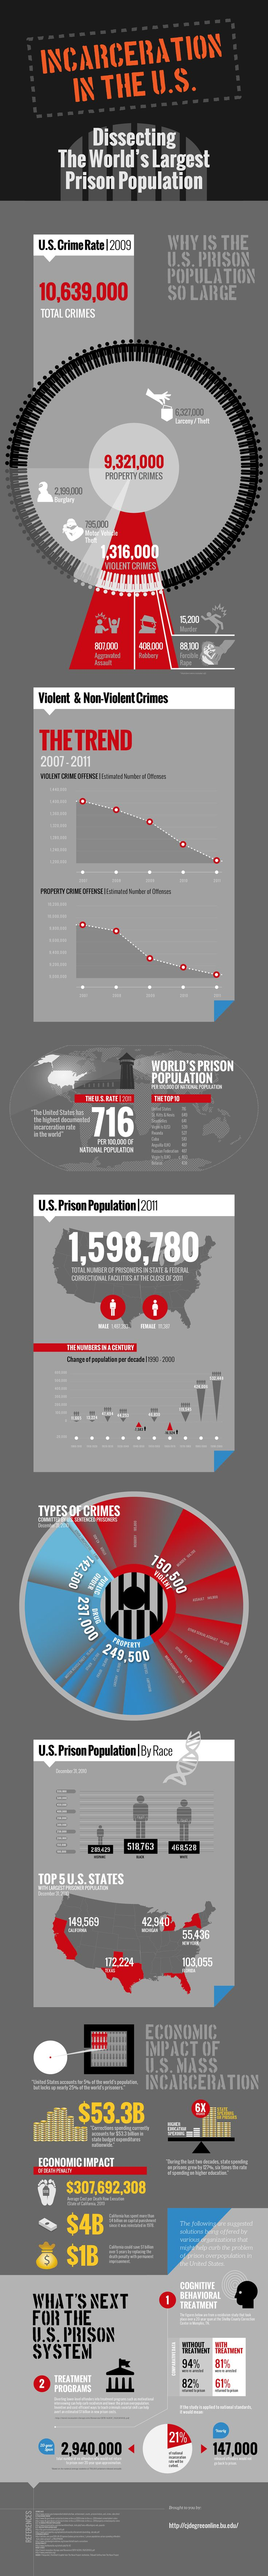 Boston University's Online Masters in Criminal Justice | US Prison System Infographic | BU Criminal Justice Degree